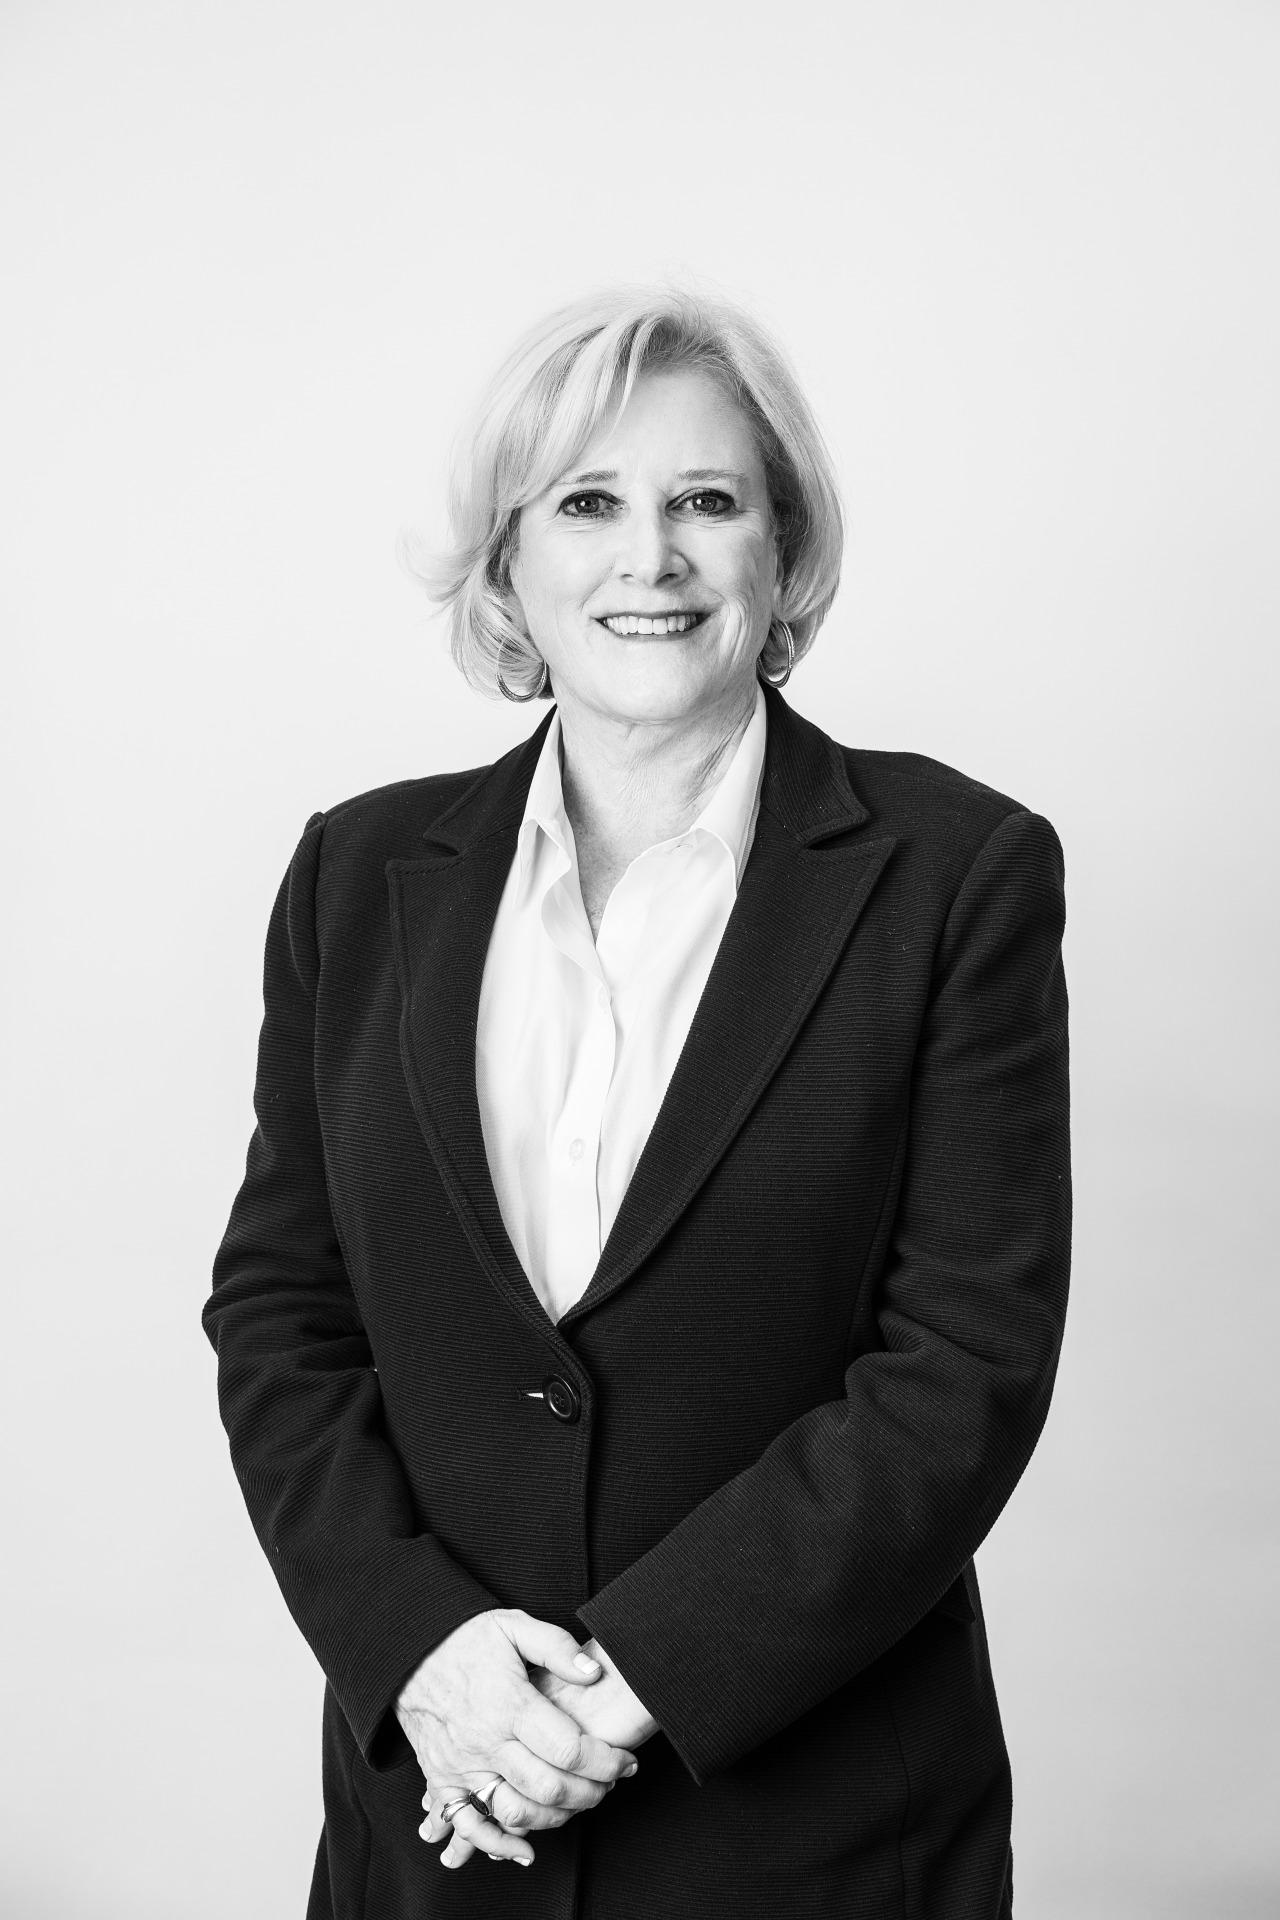 Pamela Laws